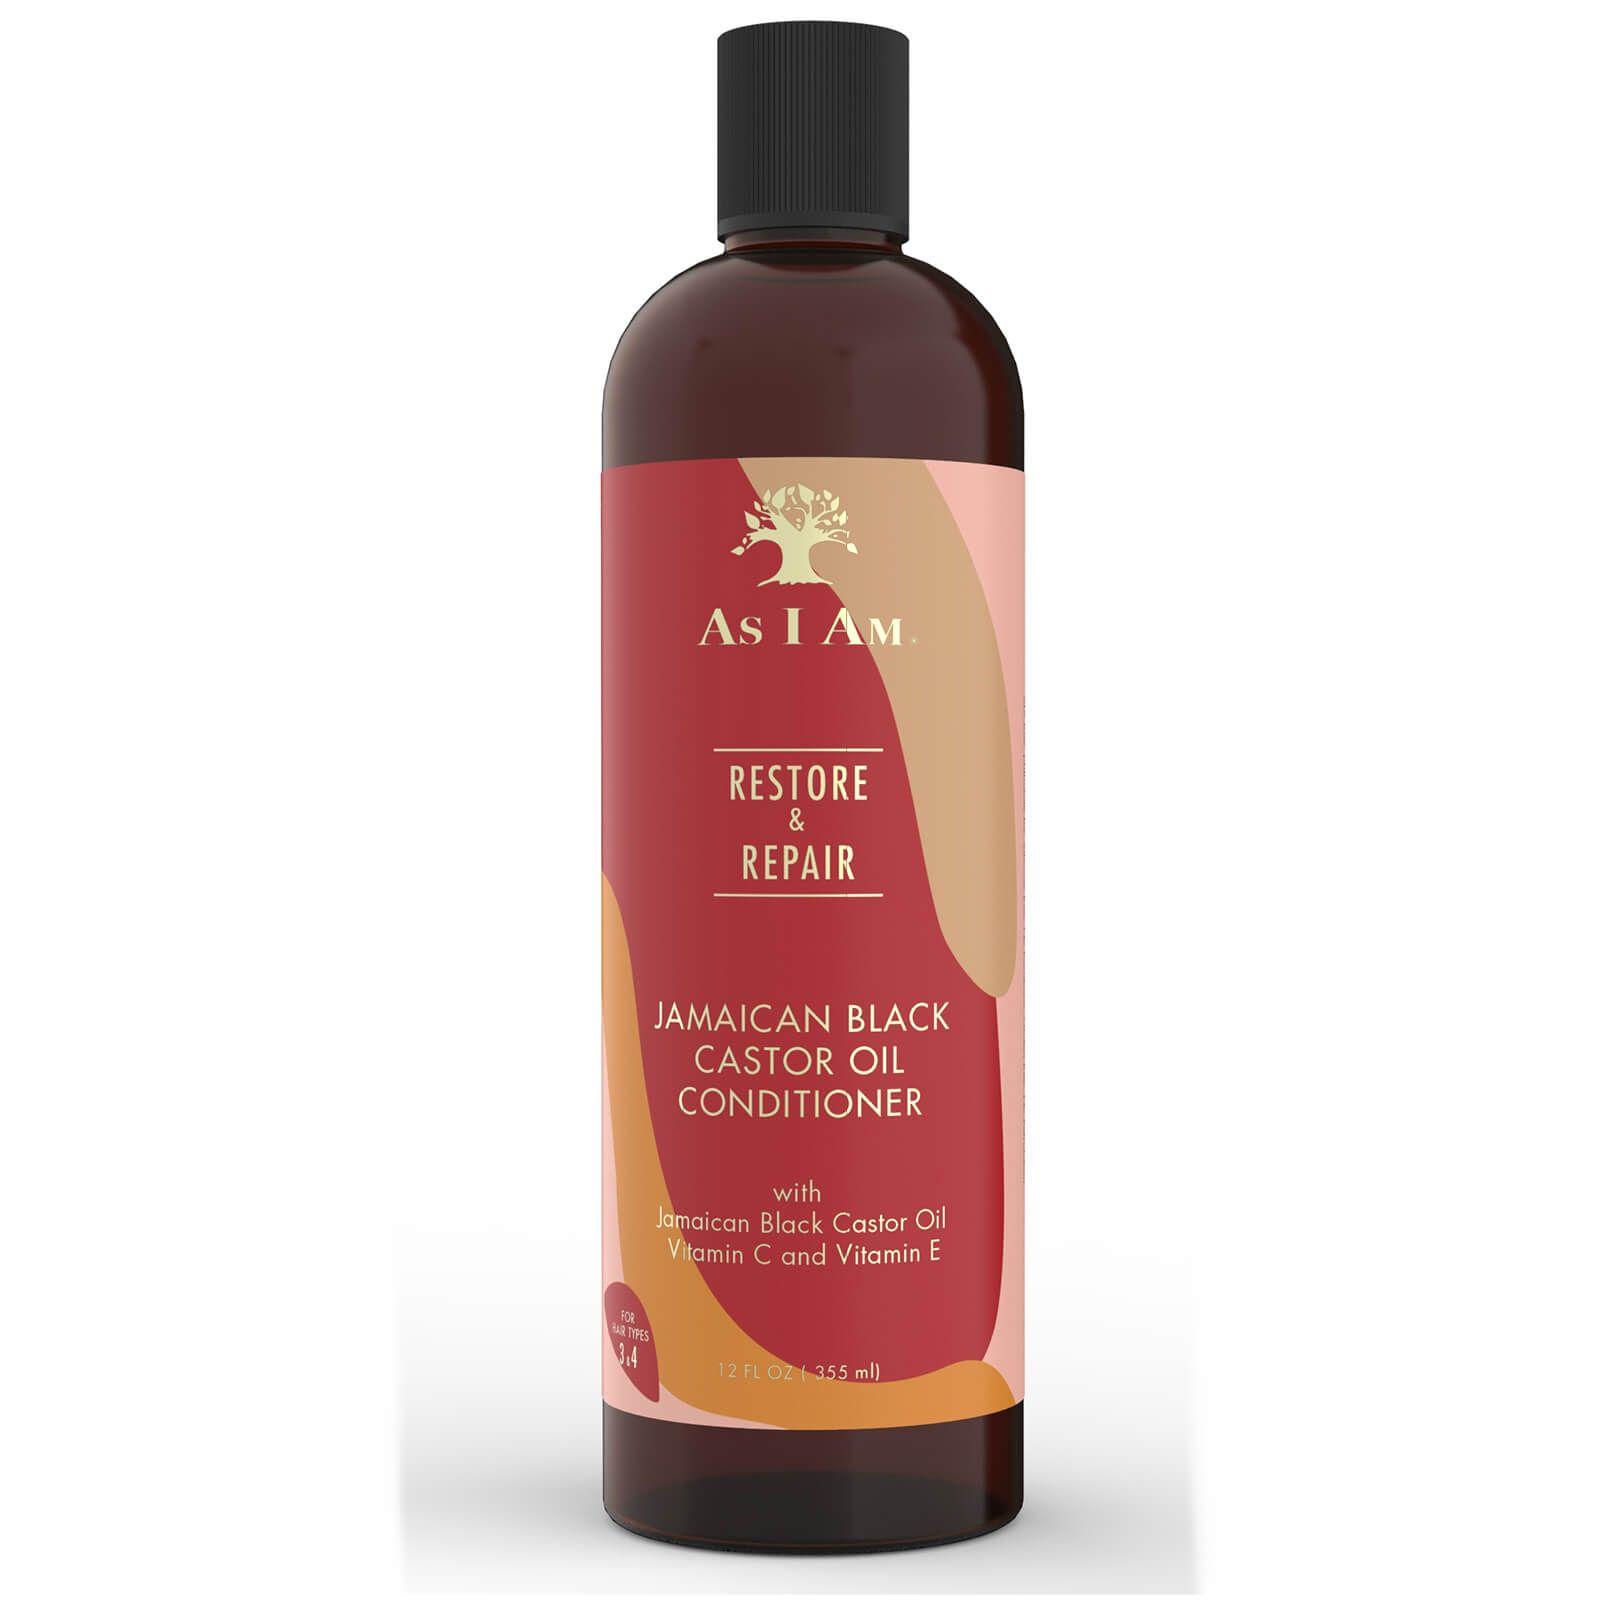 As I Am Jamaican Black Castor Oil Conditioner - 355ml